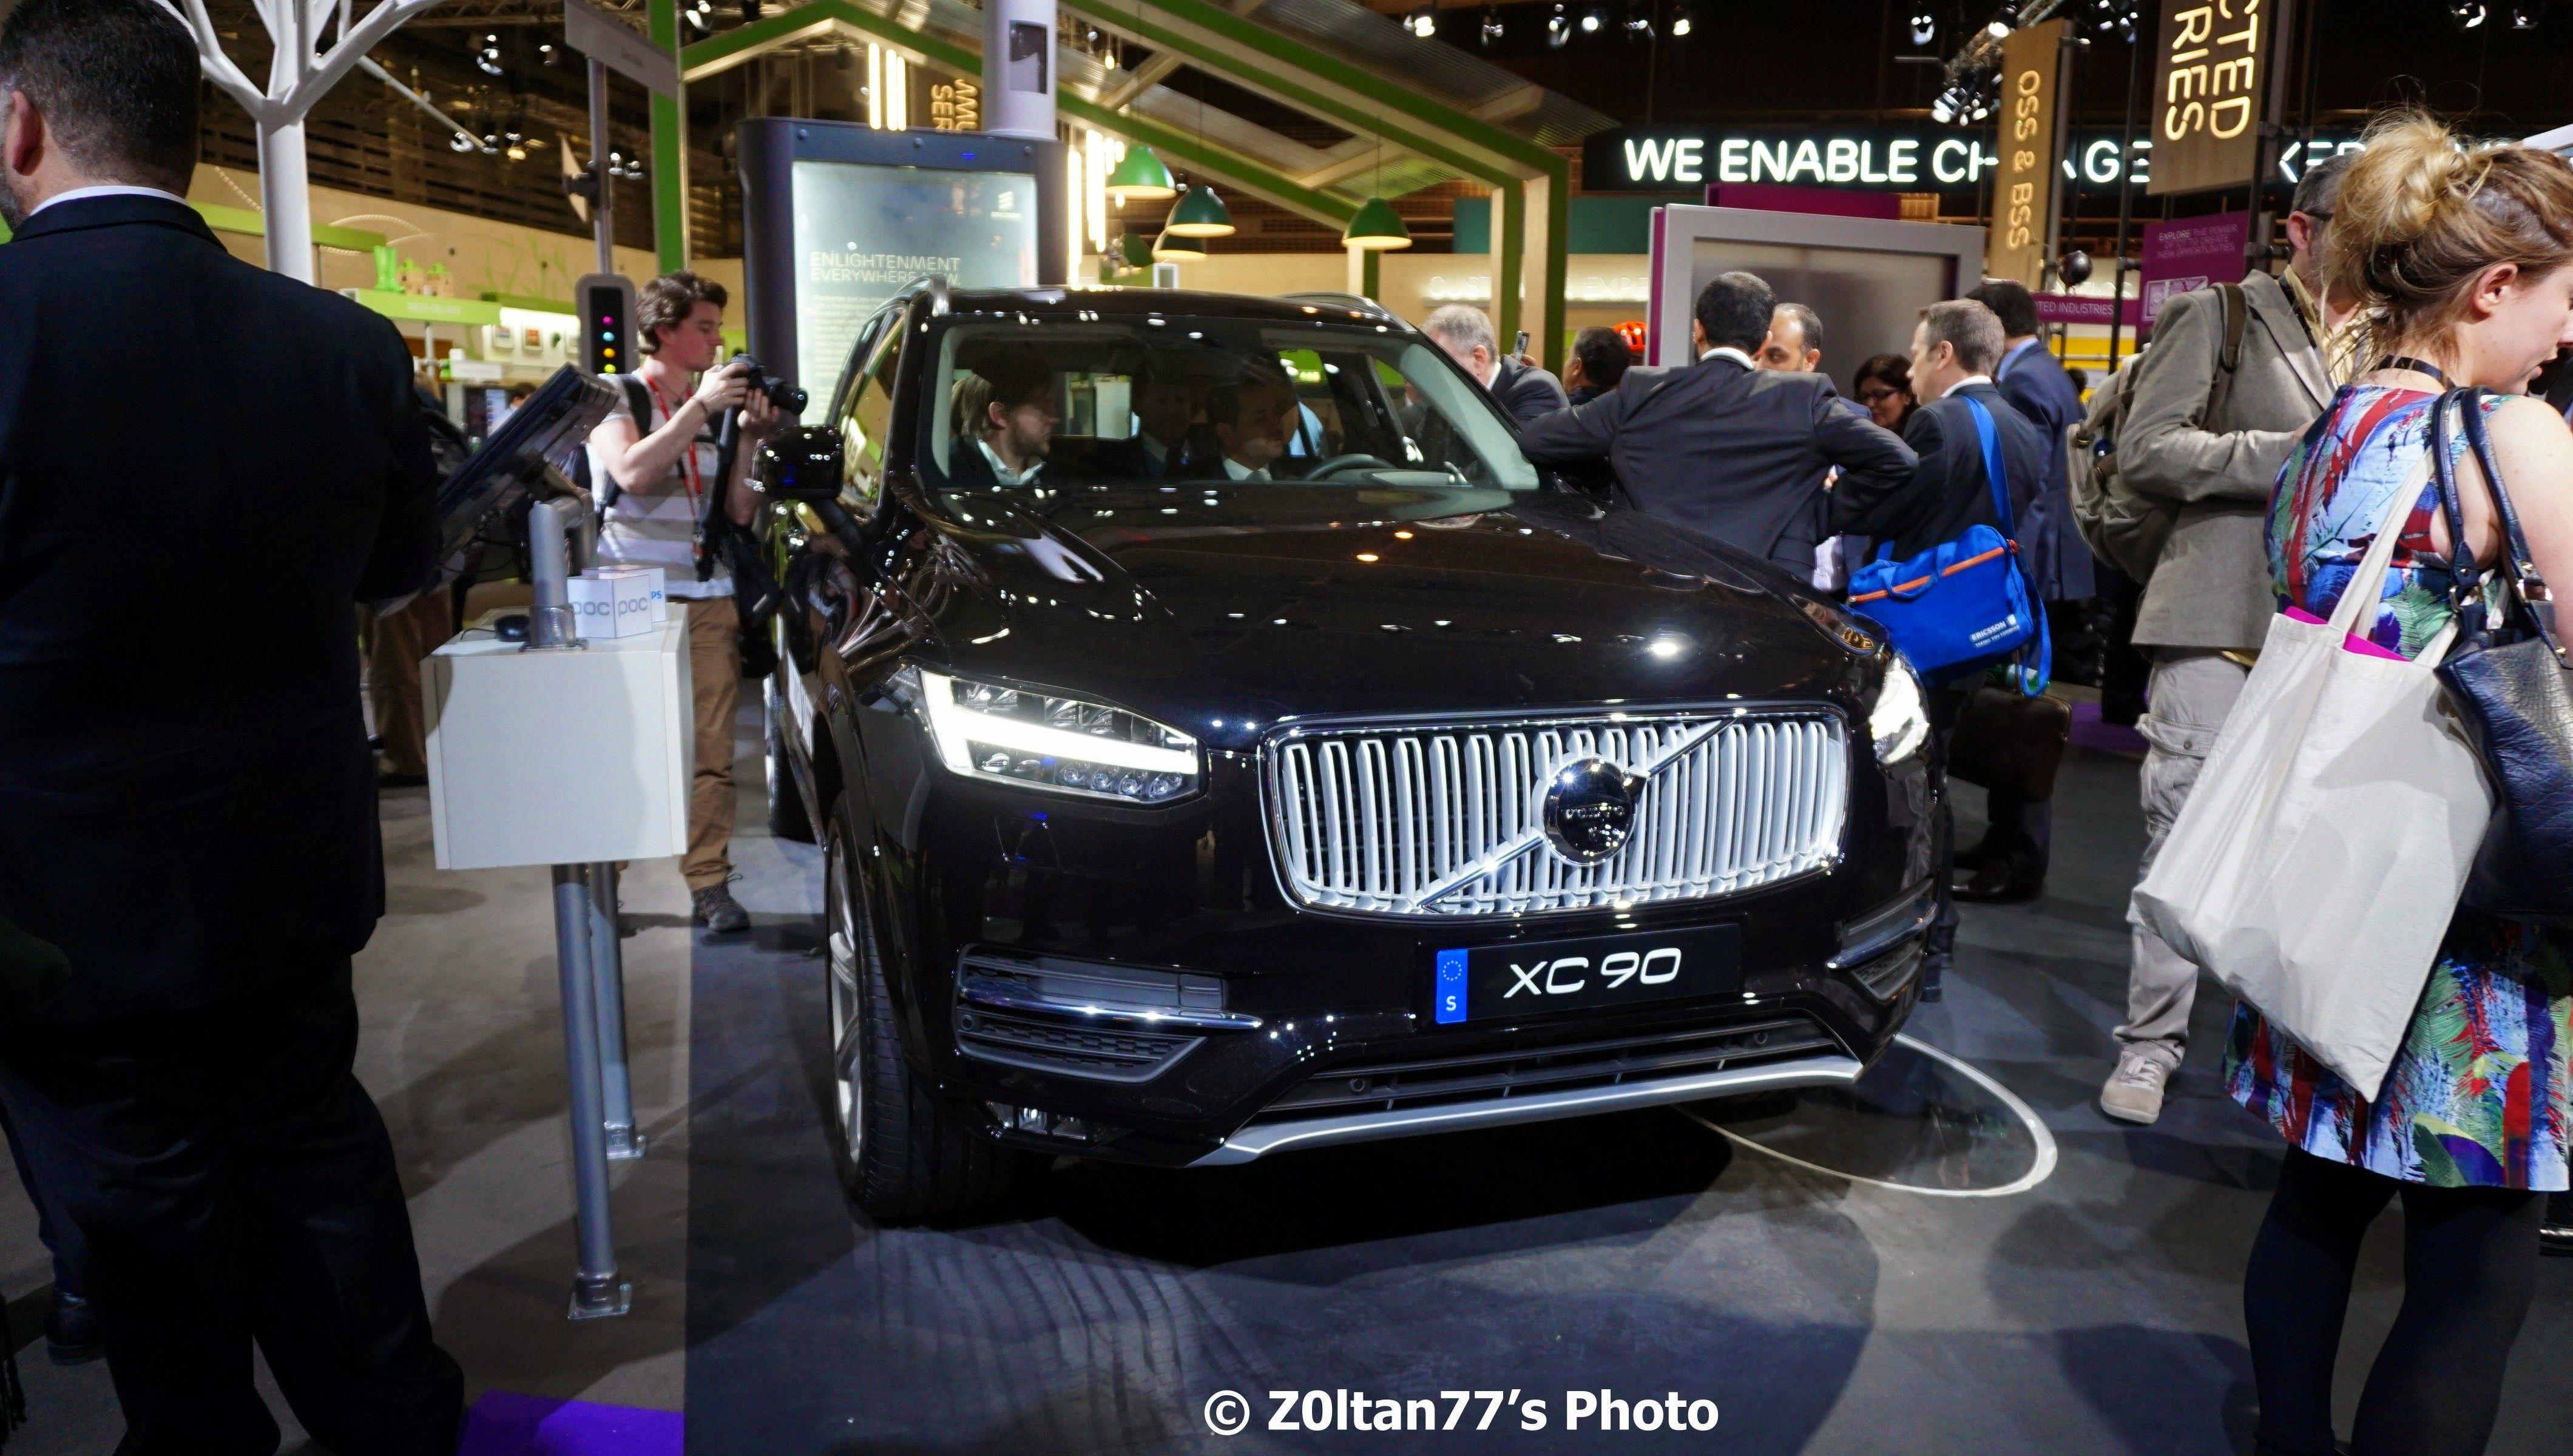 Inovatiile software dezvoltate de Ericsson imbunatatesc experienta masinilor autonome Volvo